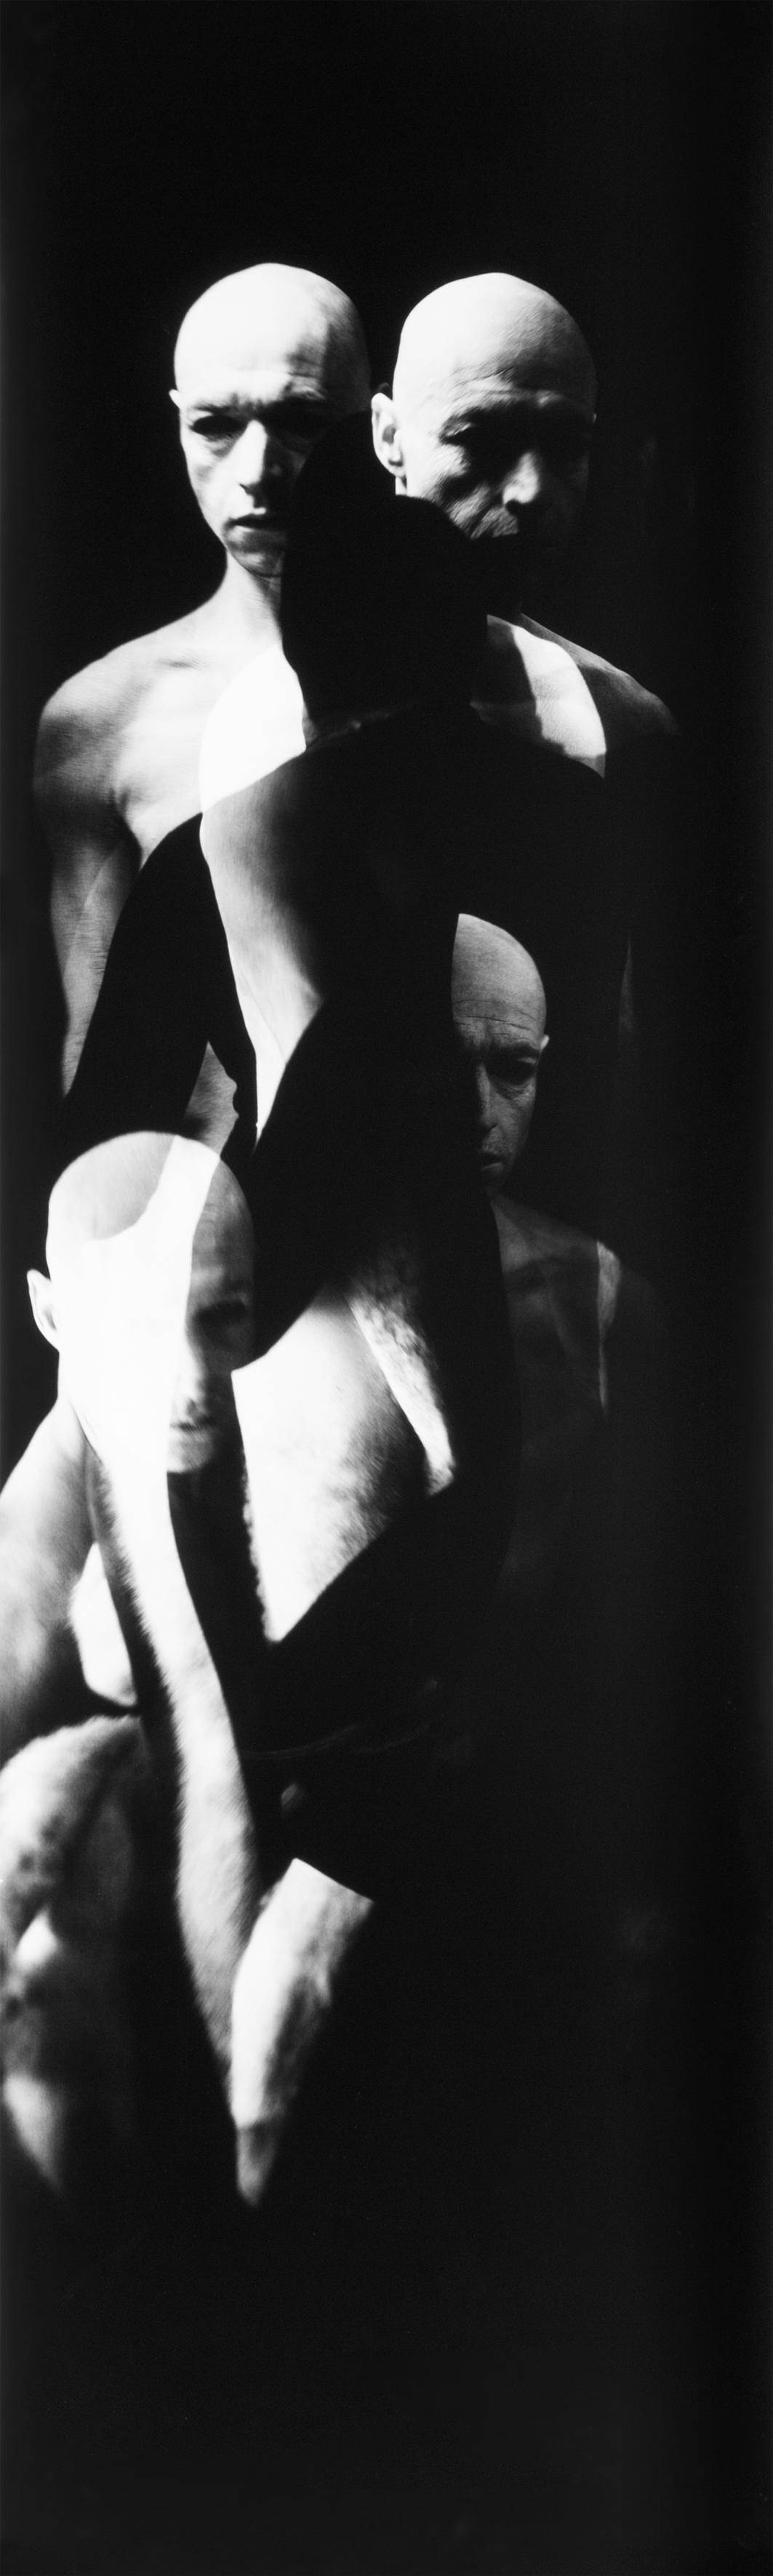 kubismus_2010©IMAGO-CAMERA_Susanna-Kraus_300-1